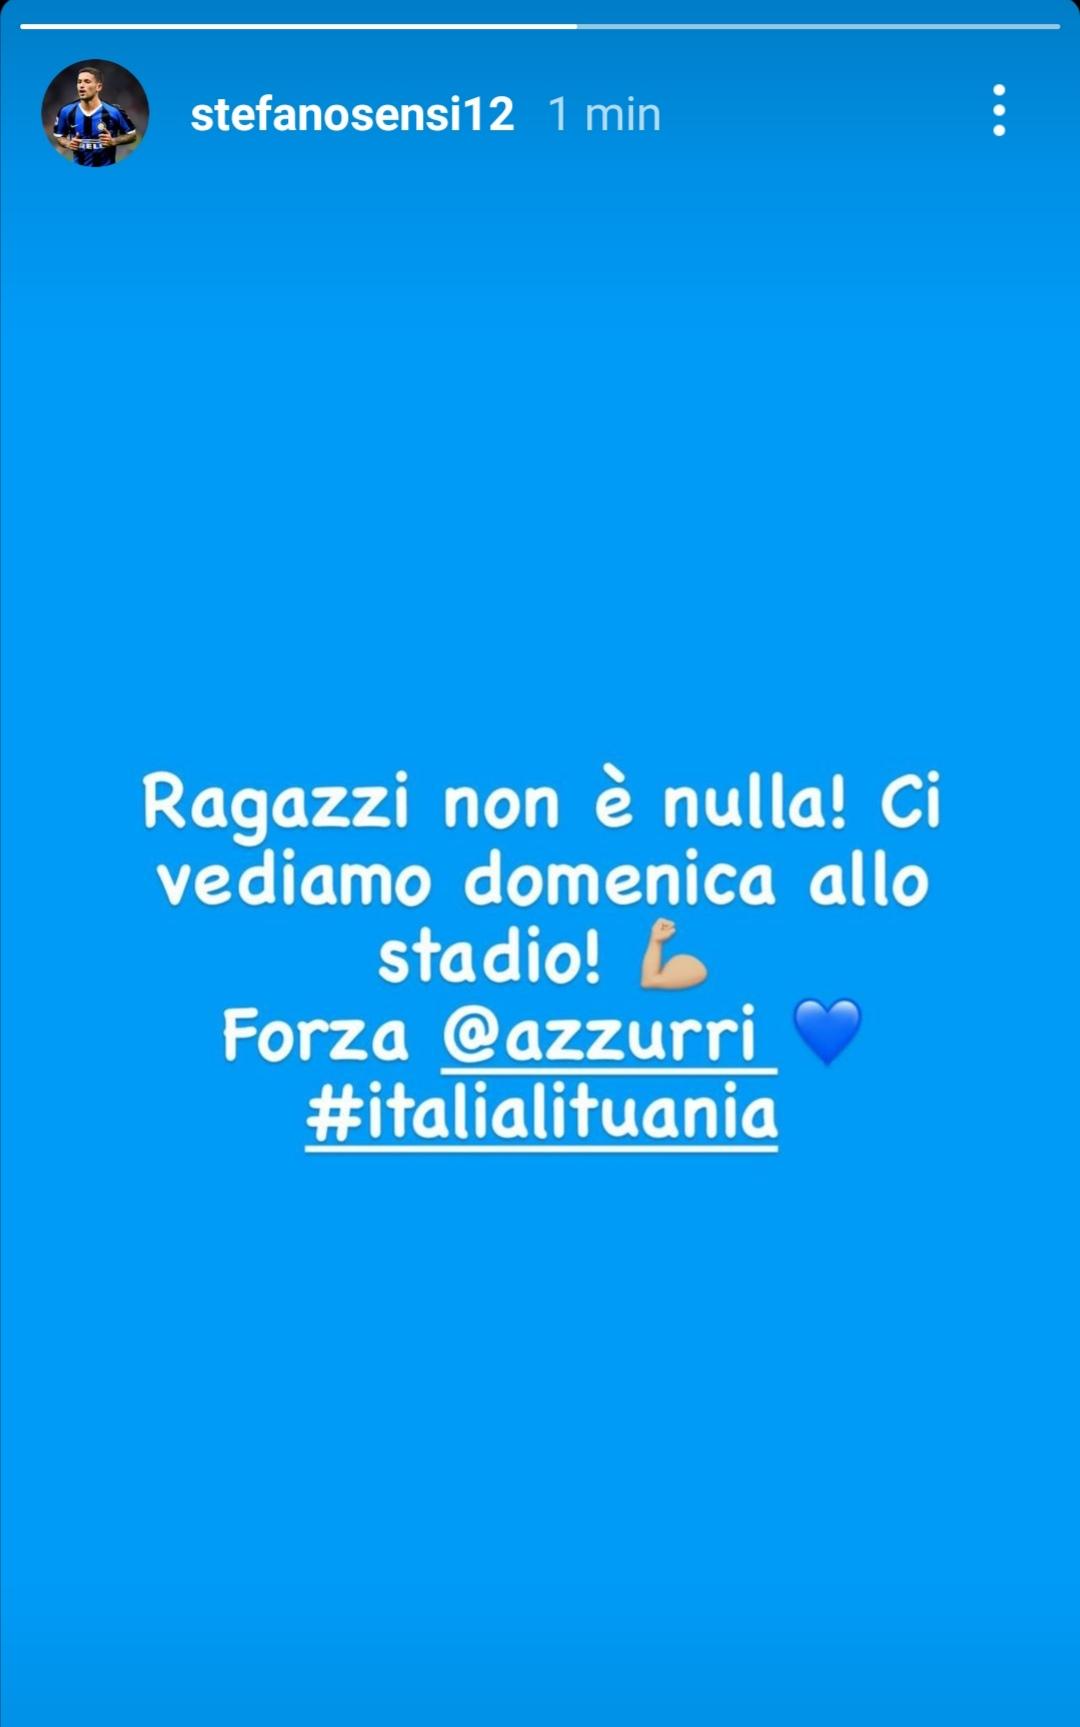 Stefano Sensi (Story Instagram, @stefanosensi12)